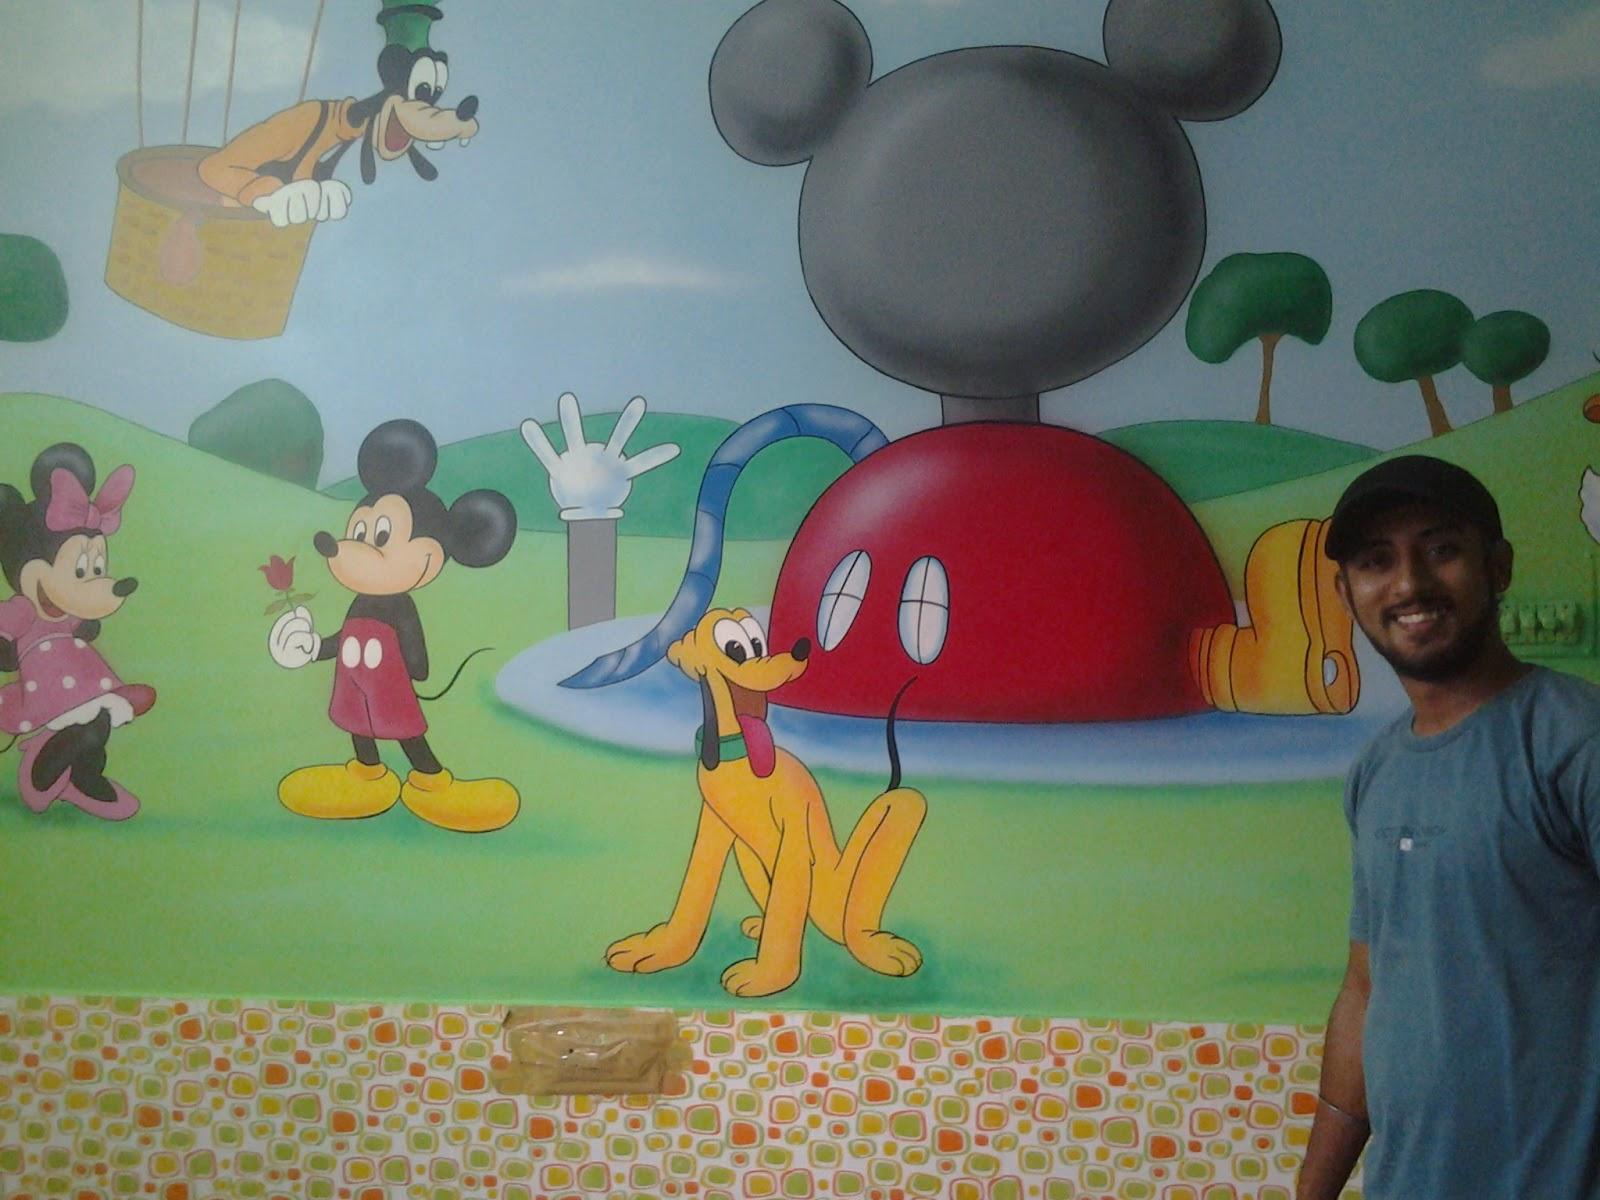 Handmade Wall Murals Made By Www Wallpaintingmumbai In Please Contact G S Arora 91 9221686556